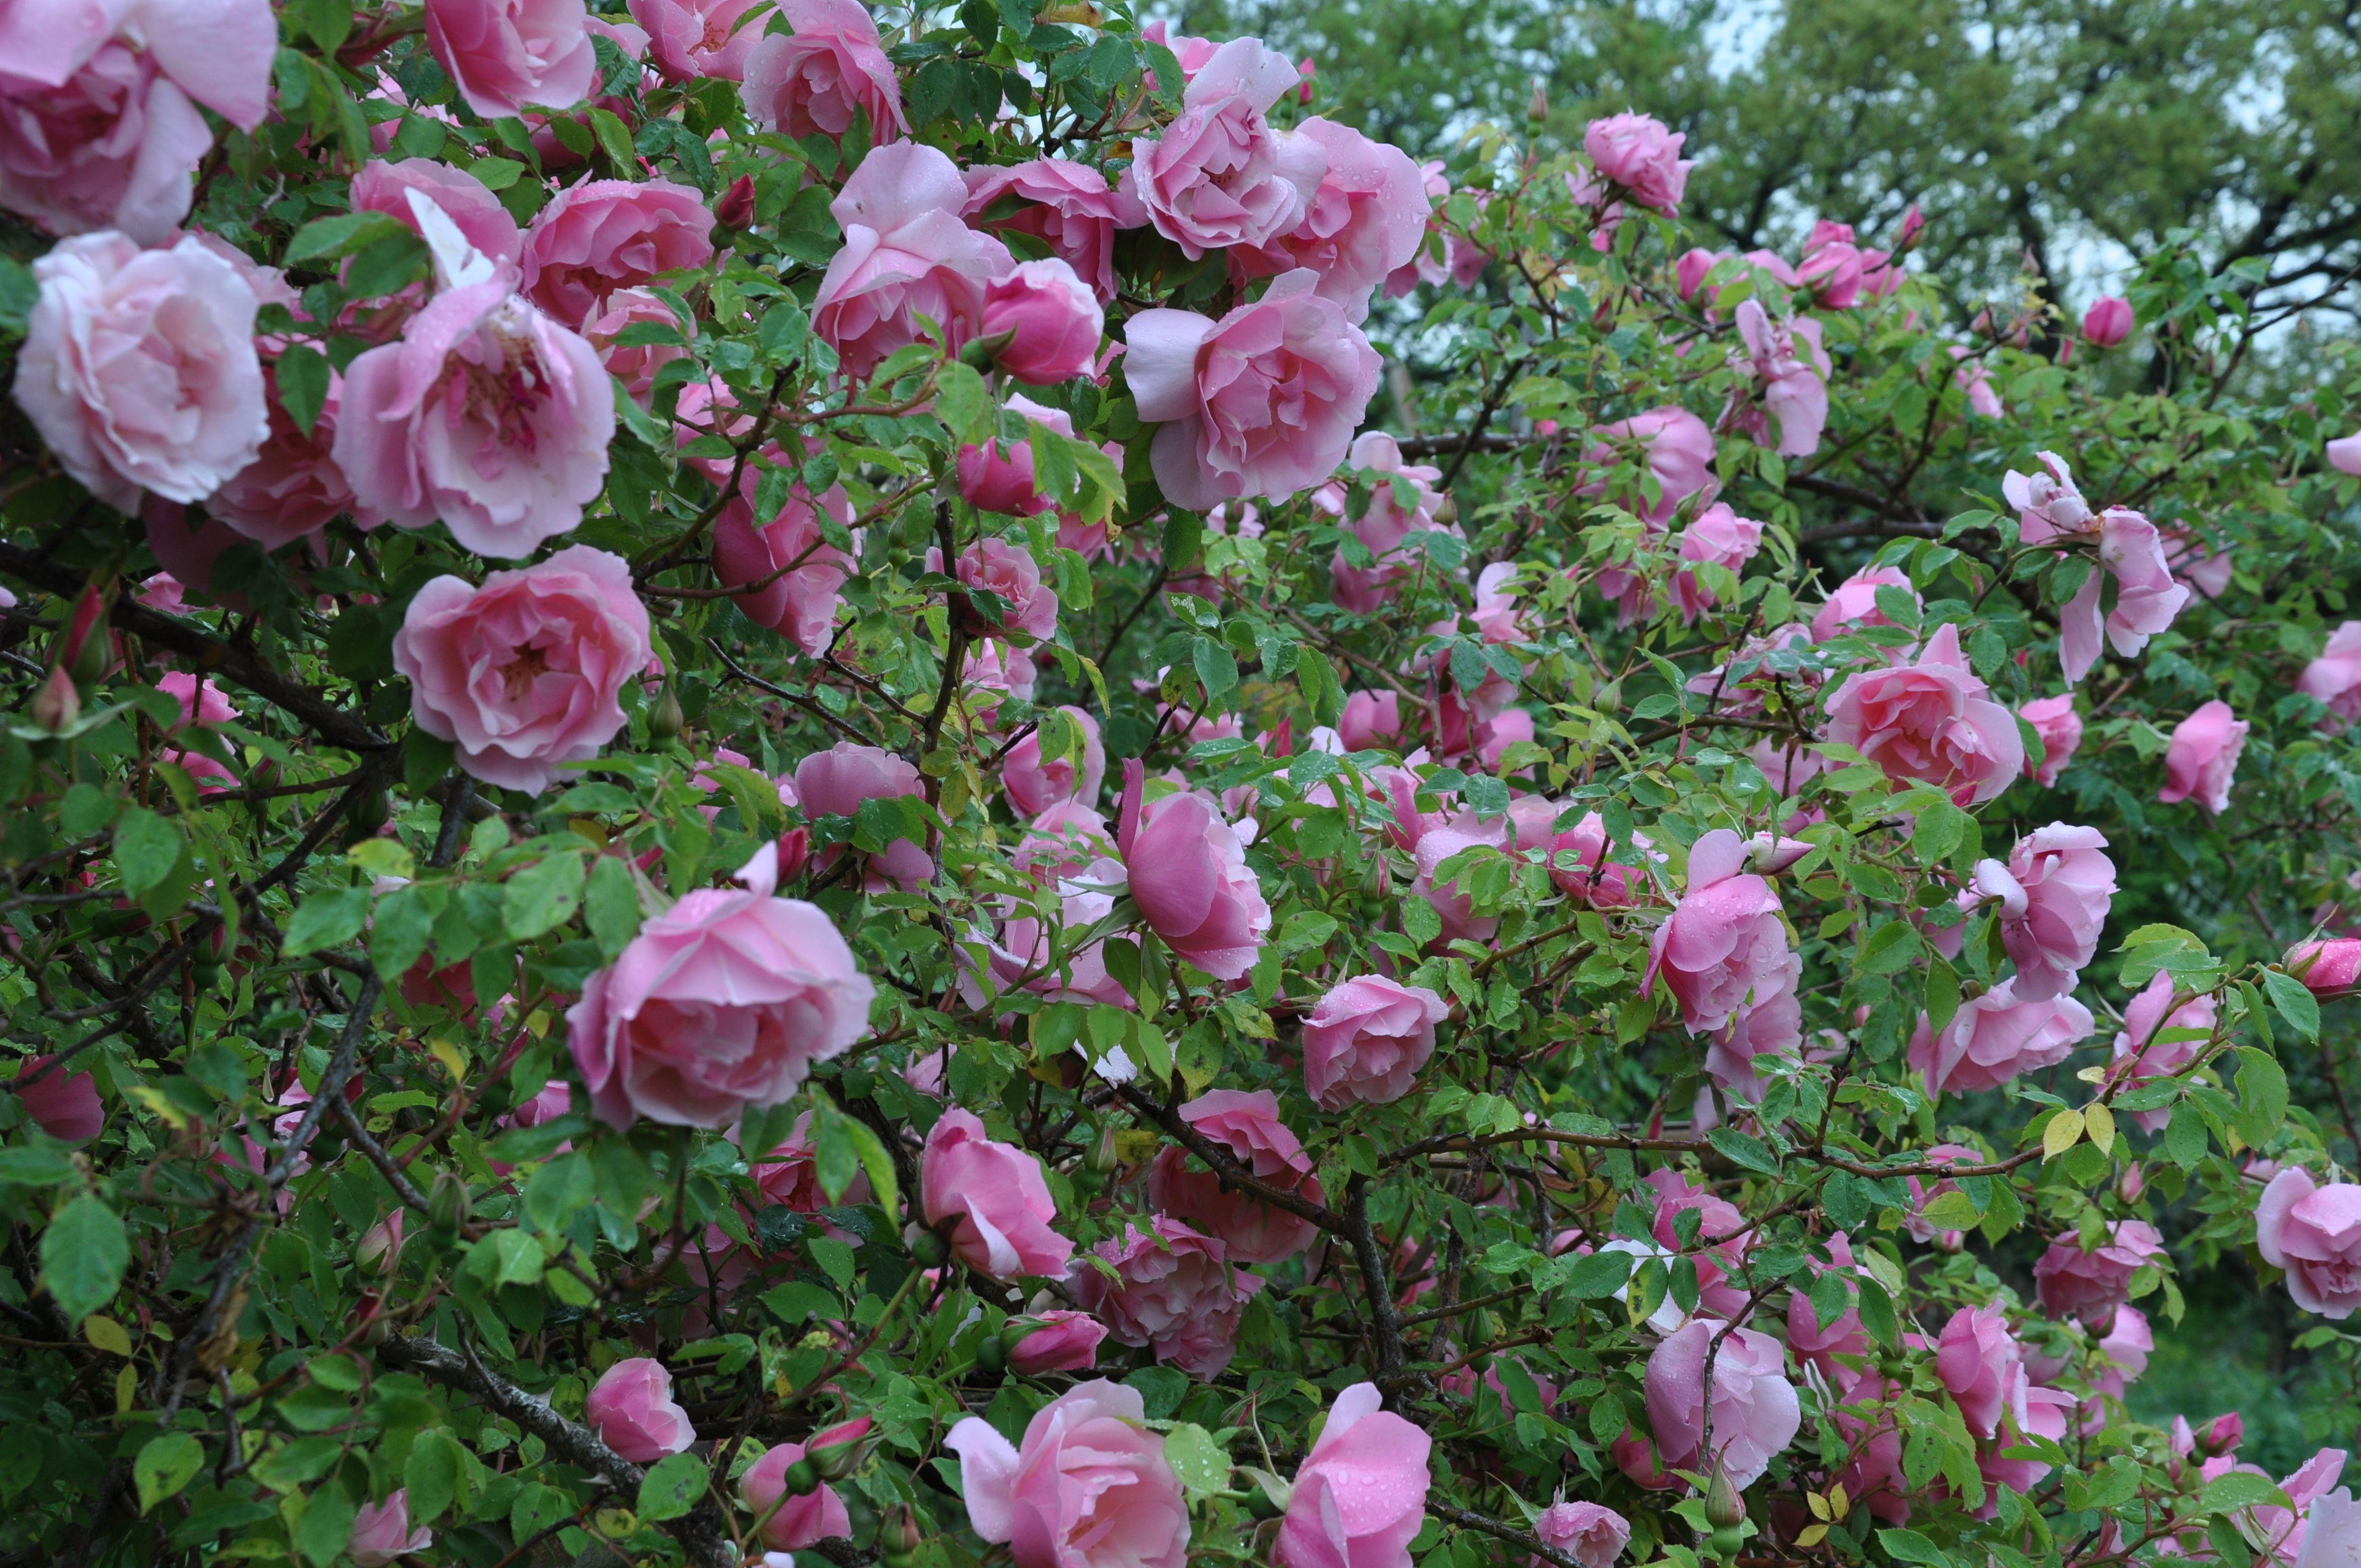 Lijiang Rose Syn Rosa Gigantea Rosea Flower Garden Garden Tours Flowers